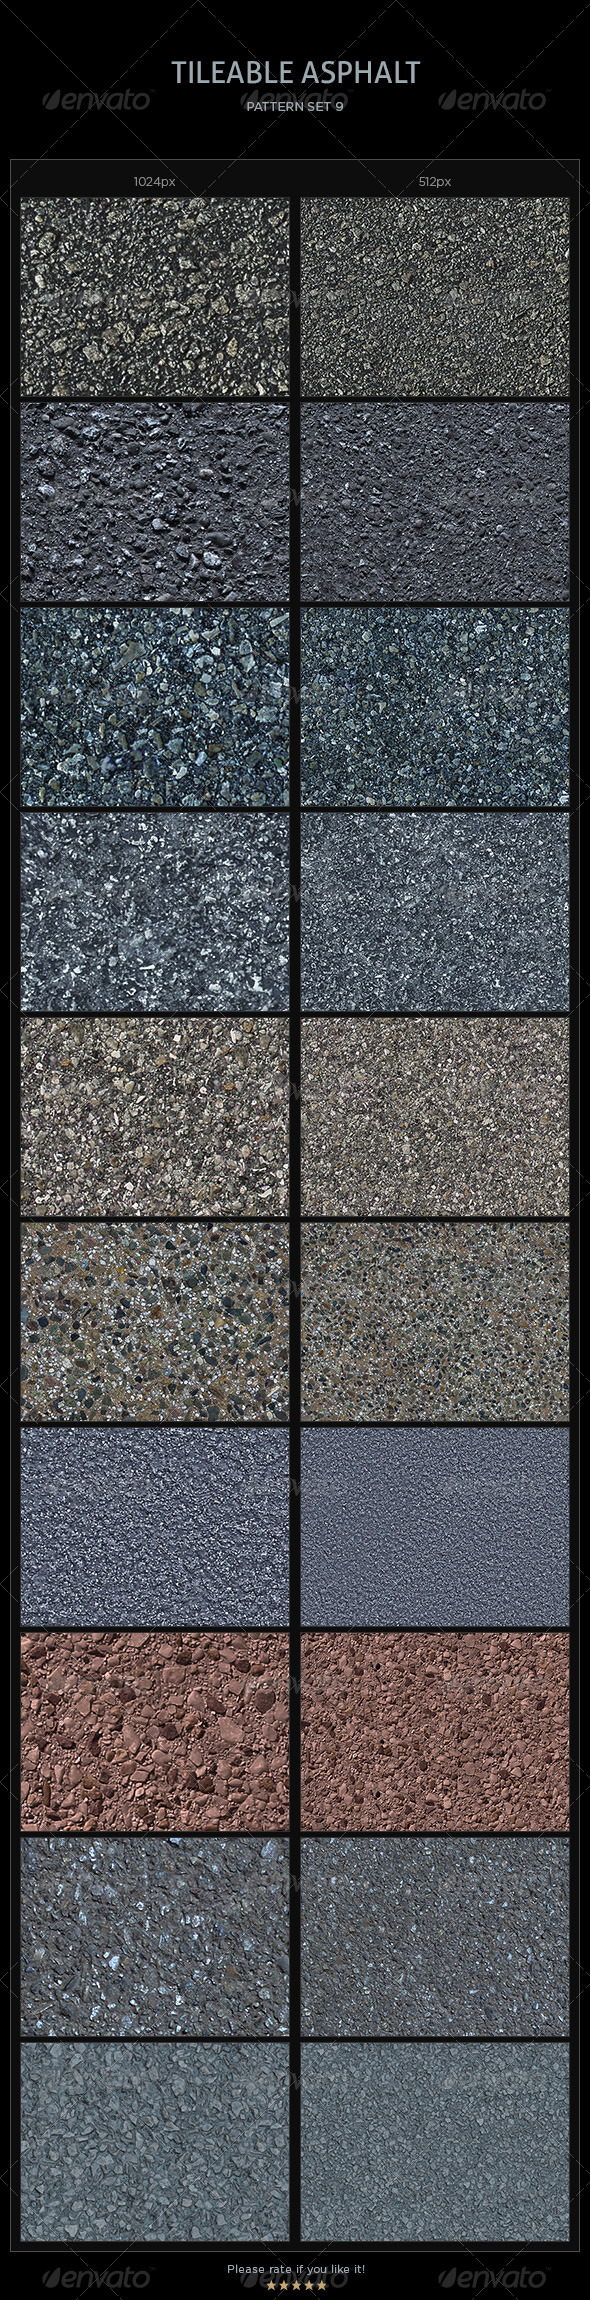 Textures architecture roads roads dirt road texture seamless - 10 Tileable Asphalt Textures Patterns